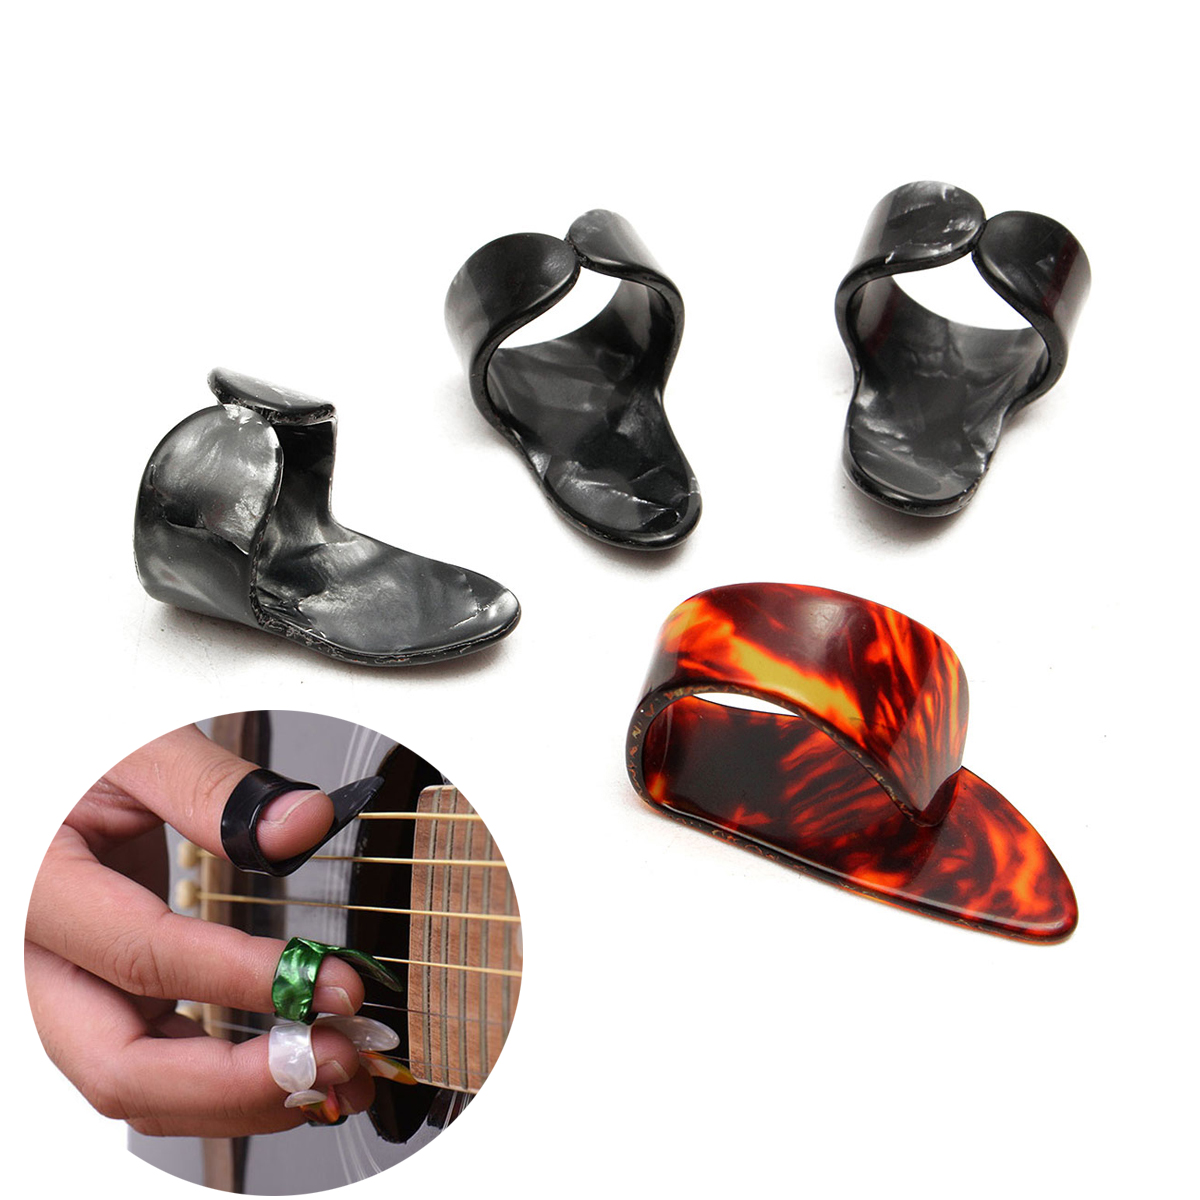 4Pcs/set Celluloid 1 Thumb + 3 Finger Guitar Picks Guitar Plectrums Sheath for Acoustic Electric Bass Guitar Random Color MX0025D